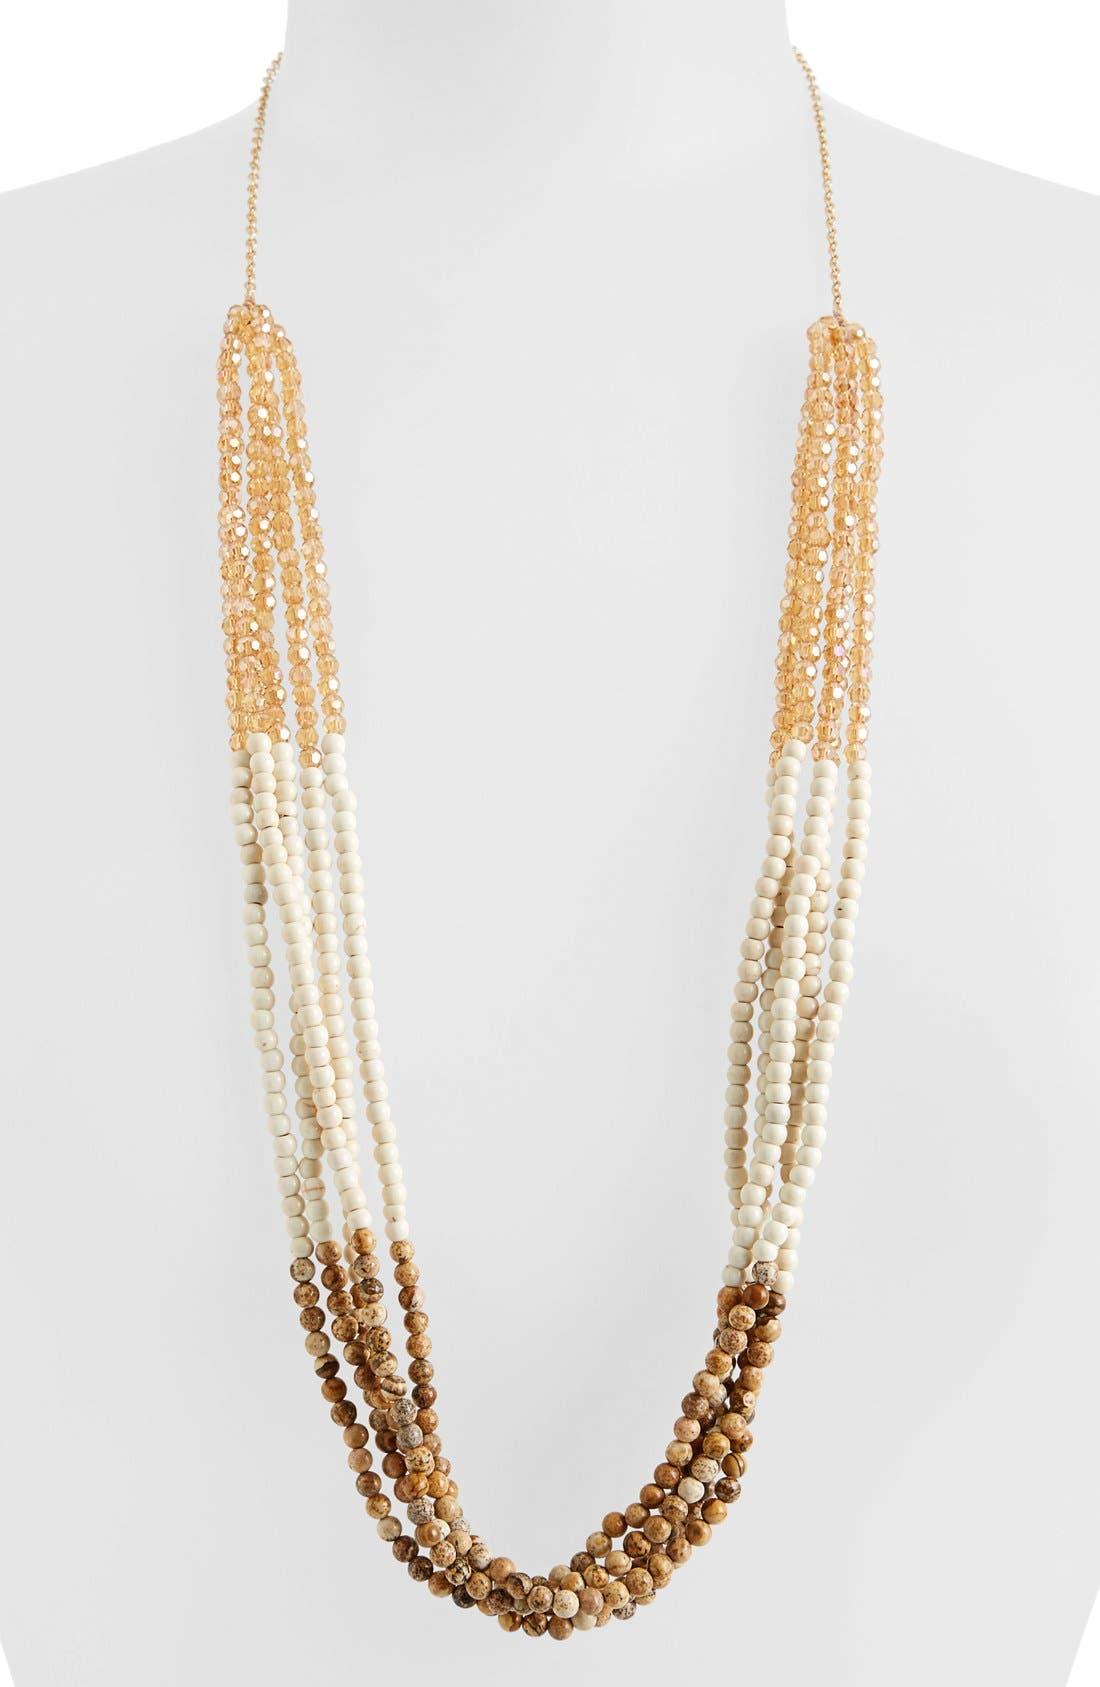 Alternate Image 1 Selected - Panacea Jasper & Howlite Multi Strand Necklace